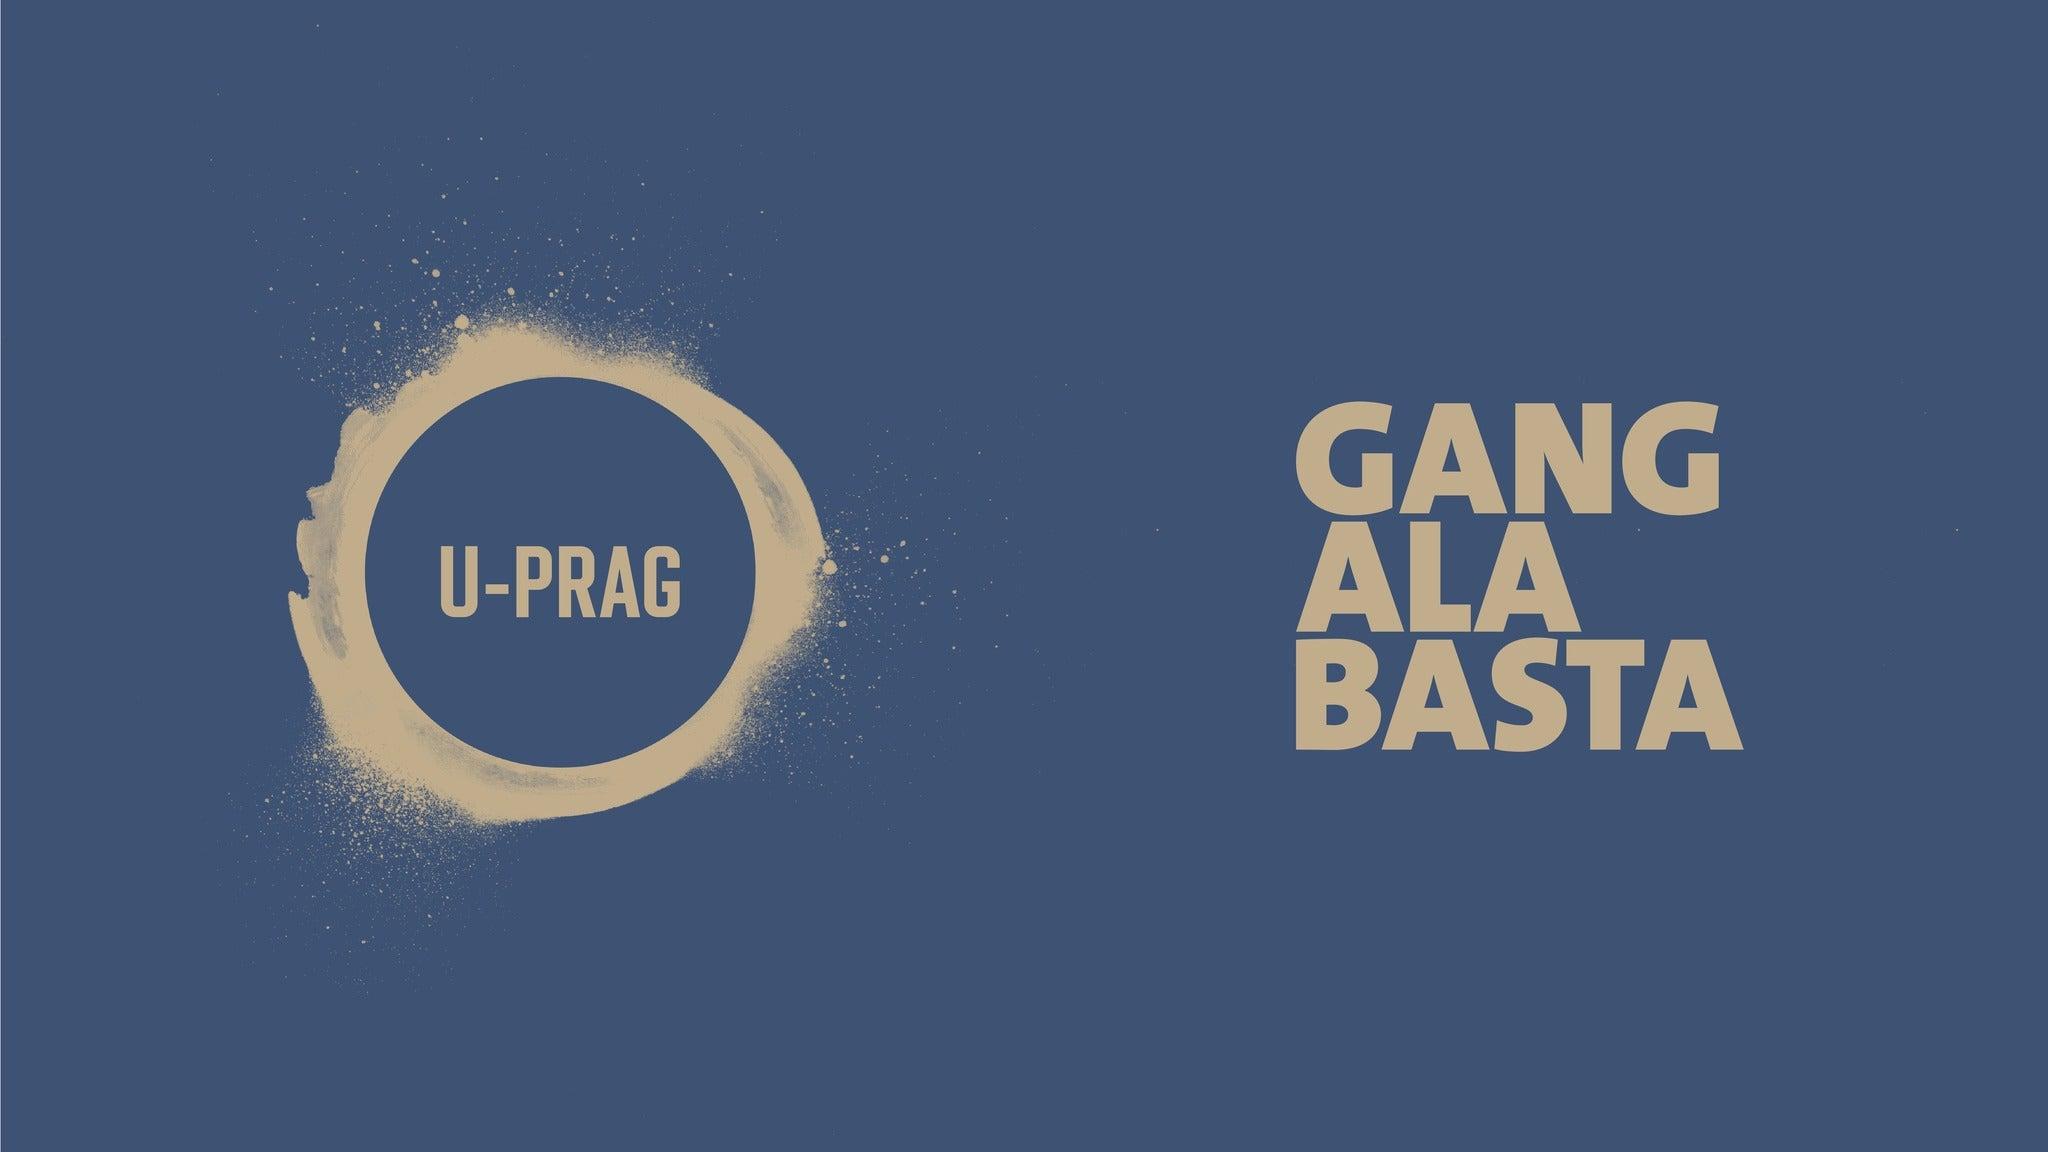 Gang Ala Basta + U-Prag